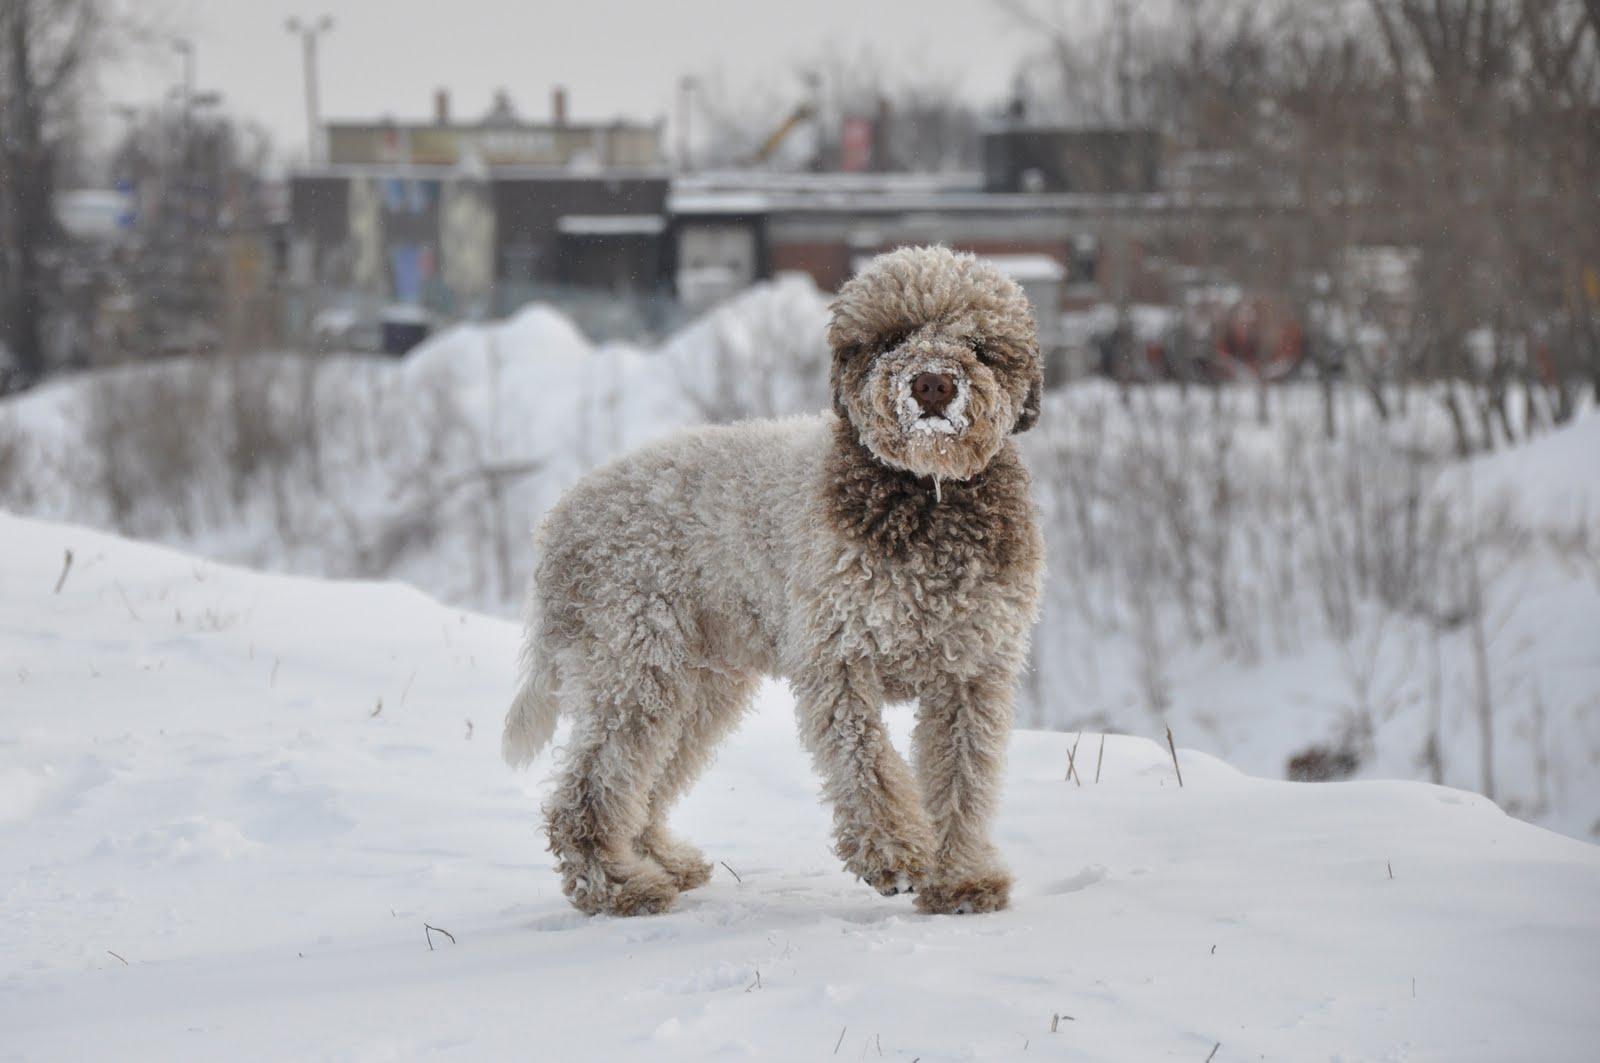 Romagnolo Dog In The Snow Wallpaper 16001063 192073 HD Wallpaper 1600x1063